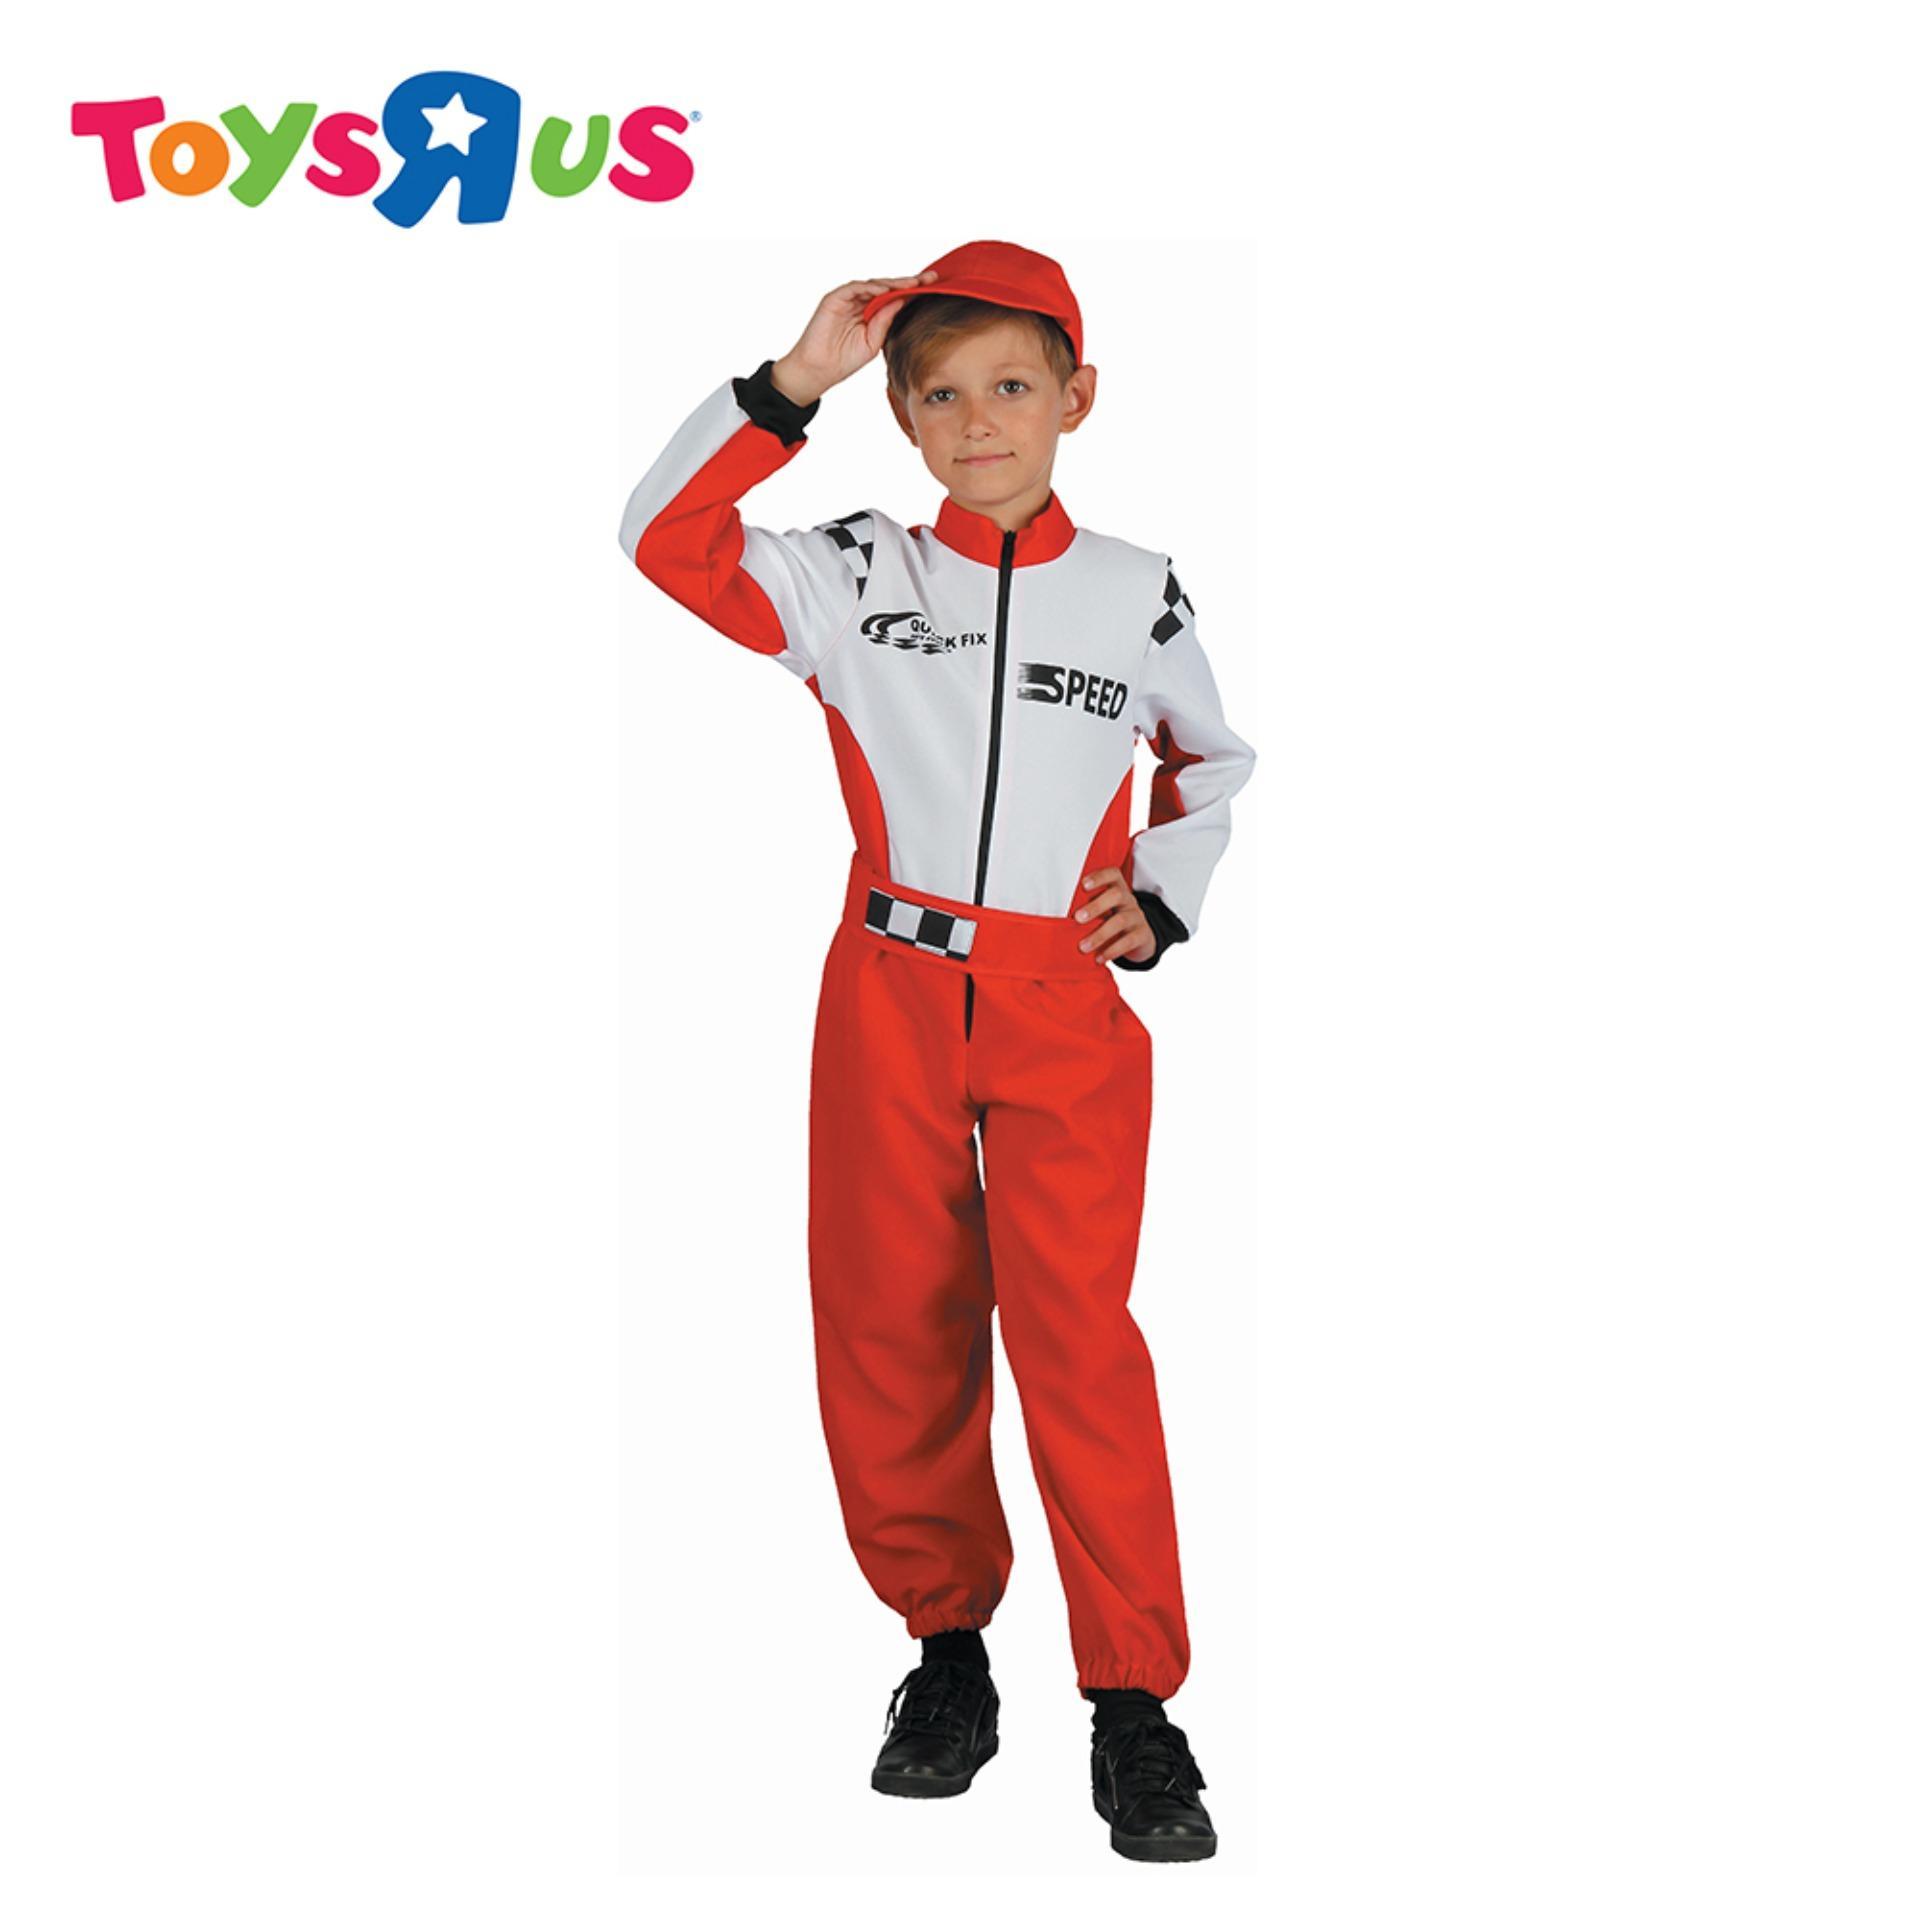 Mavis Halloween Costume Toddler.Racing Driver Costume Large